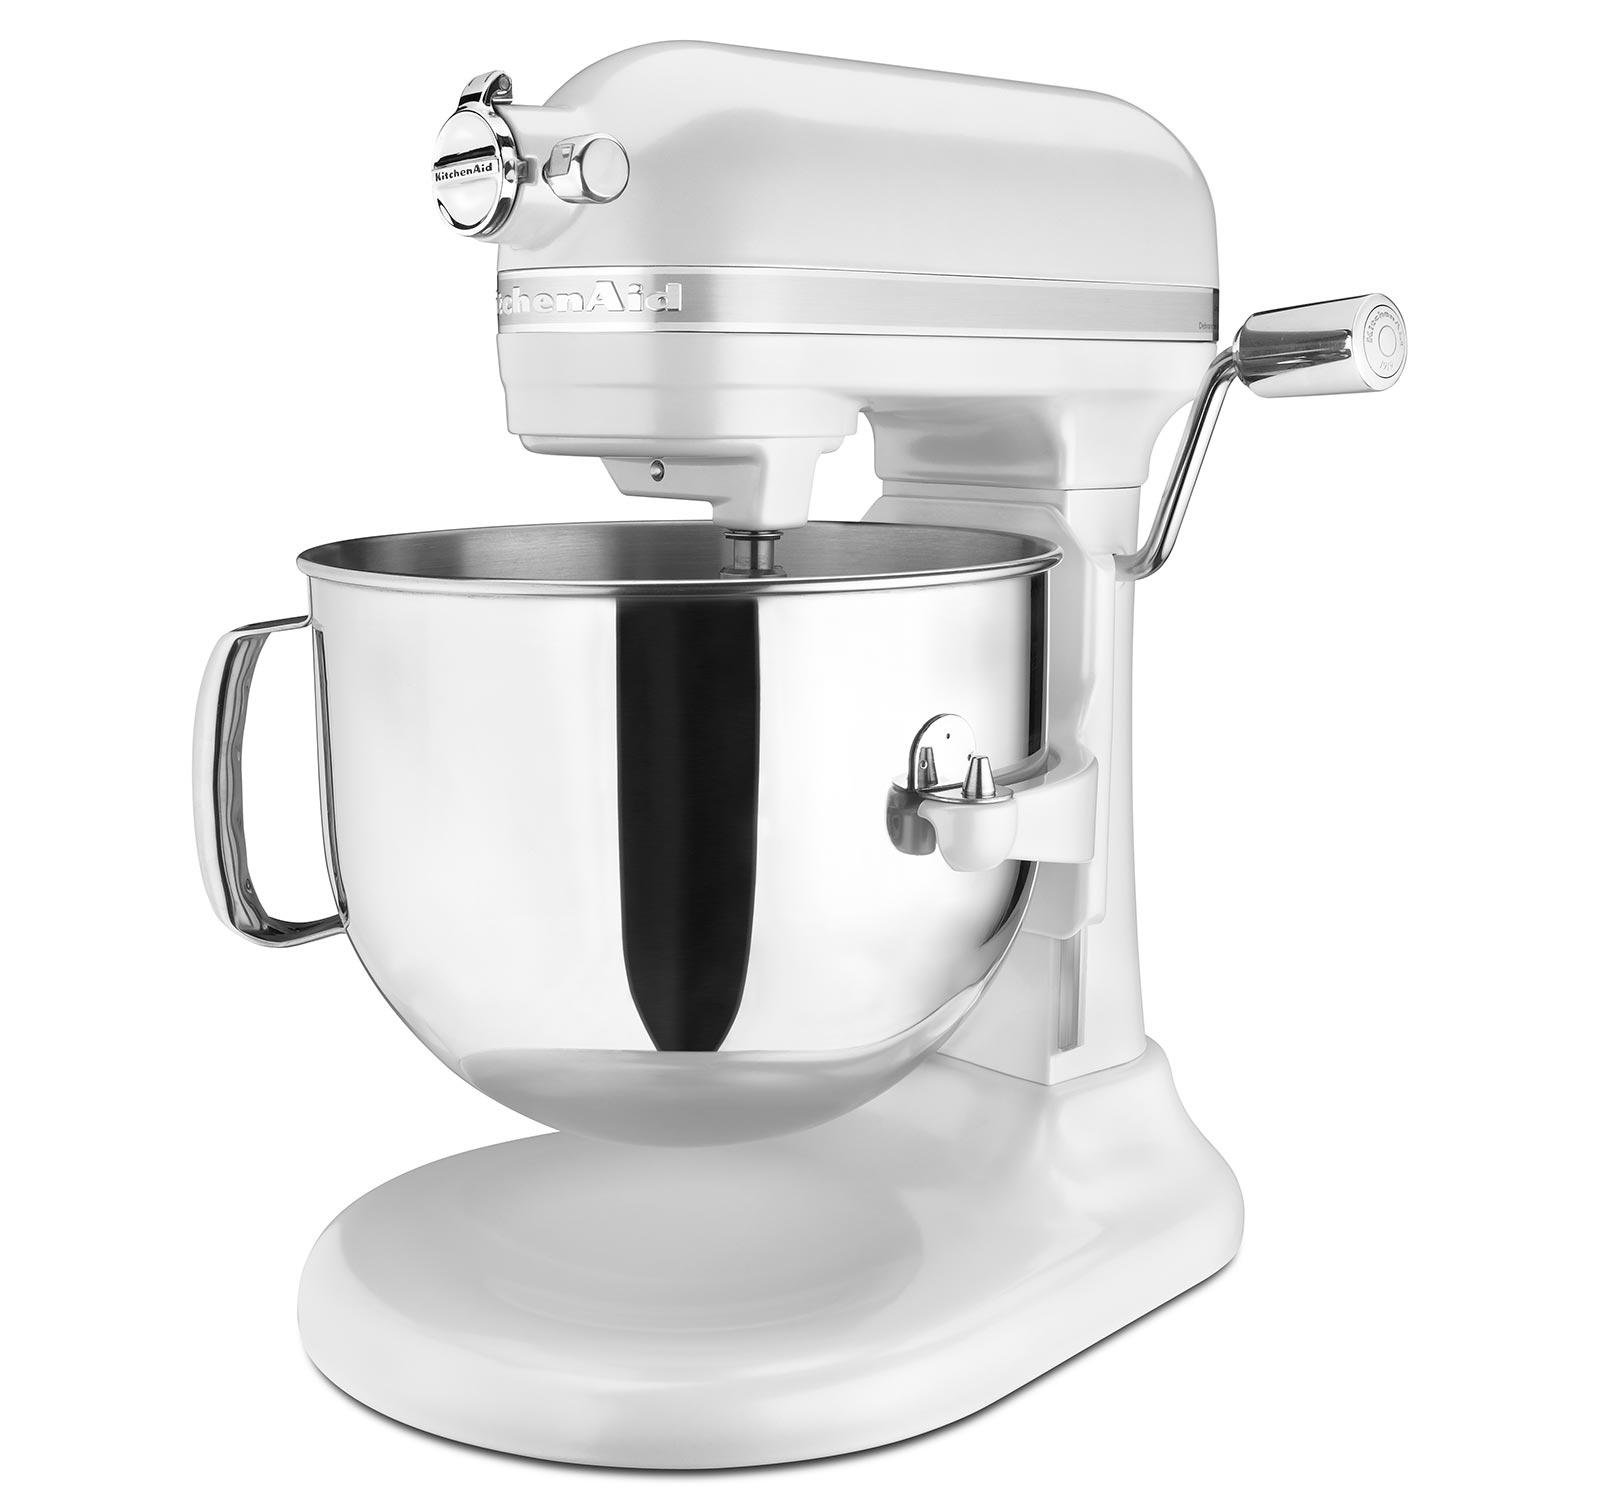 KitchenAid KitchenAid KSM7586PFP Frosted Pearl 7-Quart Pro Line Stand Mixer